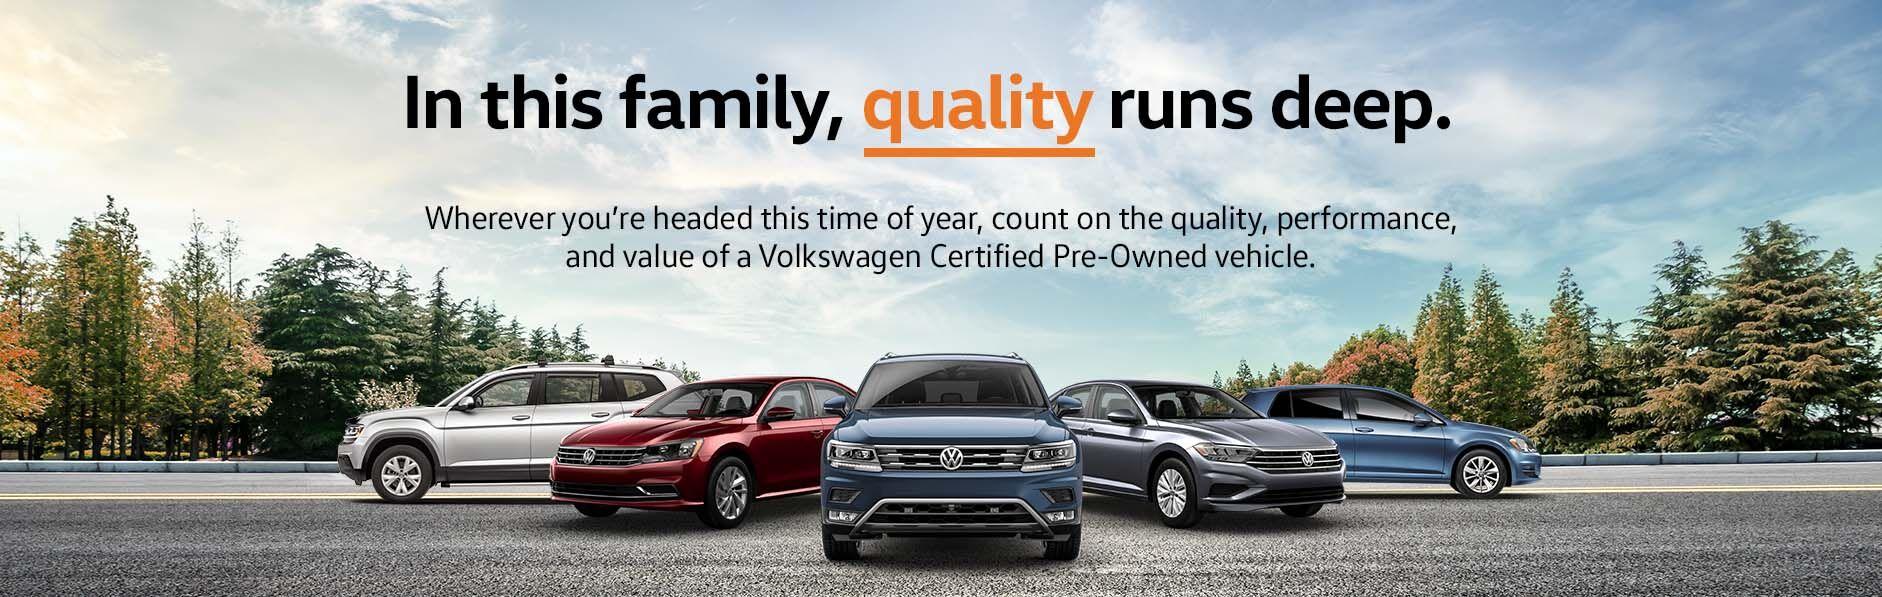 Volkswagen Certified Pre-Owned in Chattanooga, TN